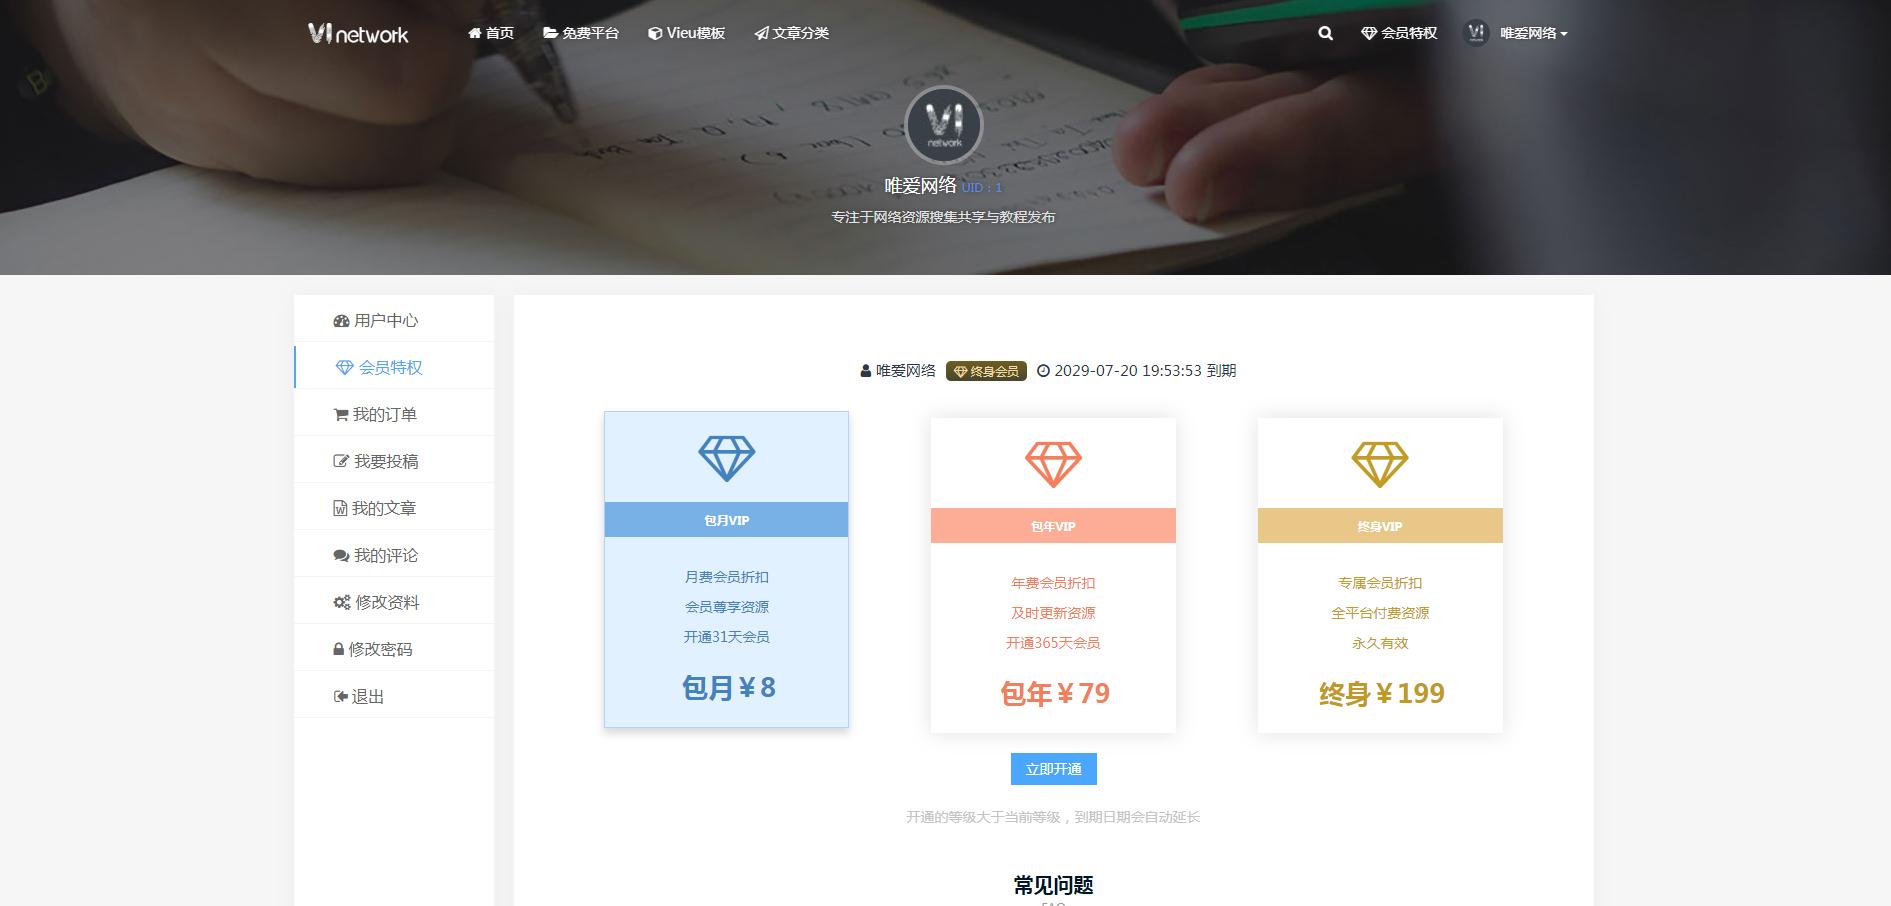 WordPress高级模板Vieu主题_V4正式版_介绍购买说明